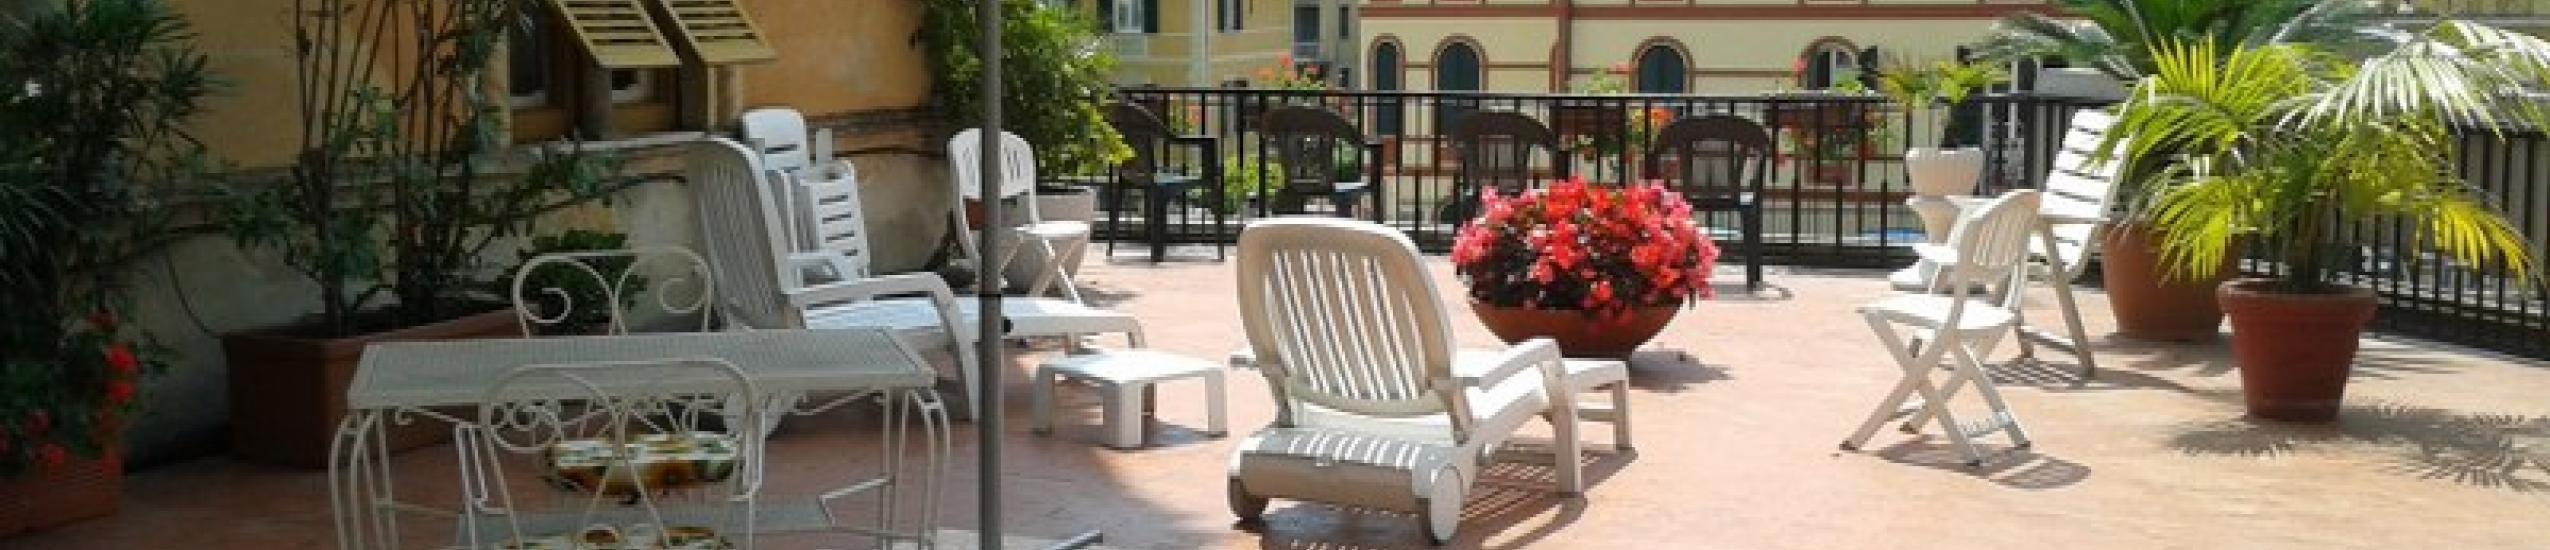 Hotel Portofino (0)